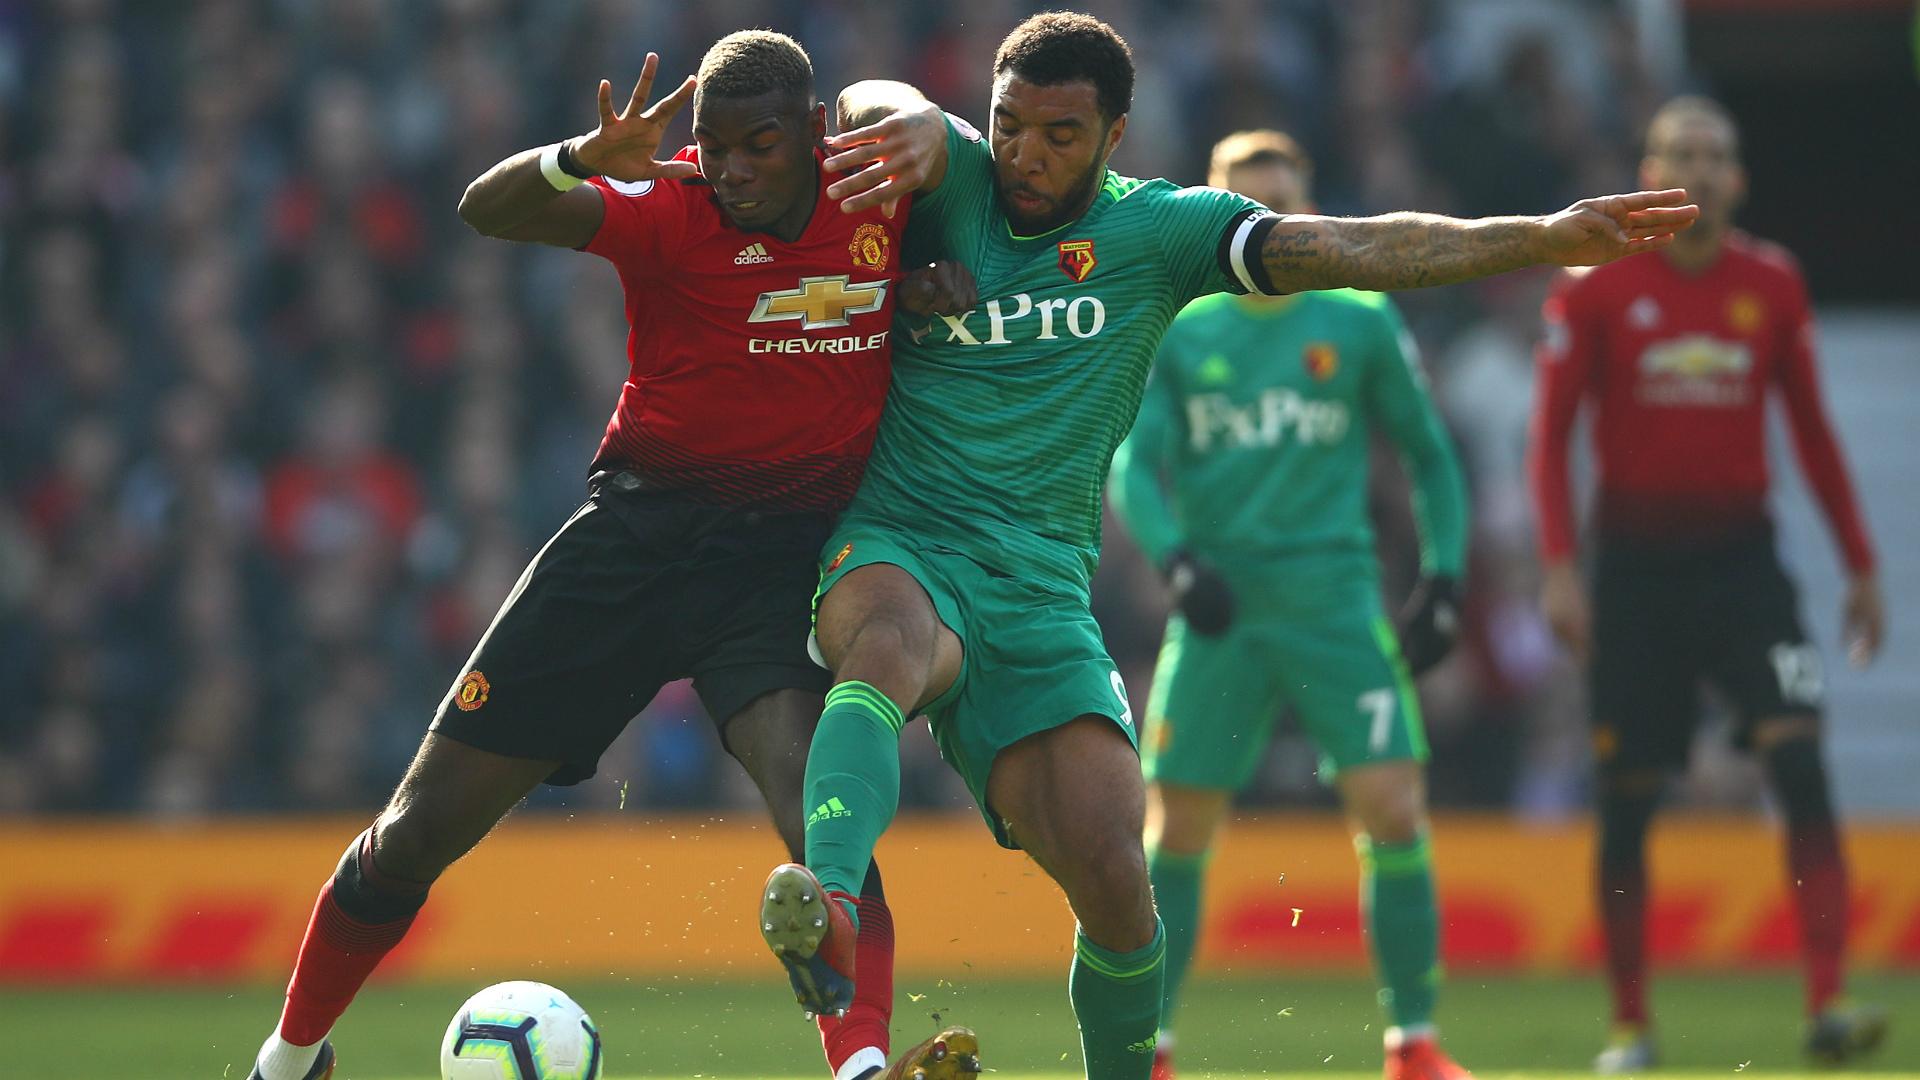 Paul Pogba Troy Deeney Manchester United Watford 30032019